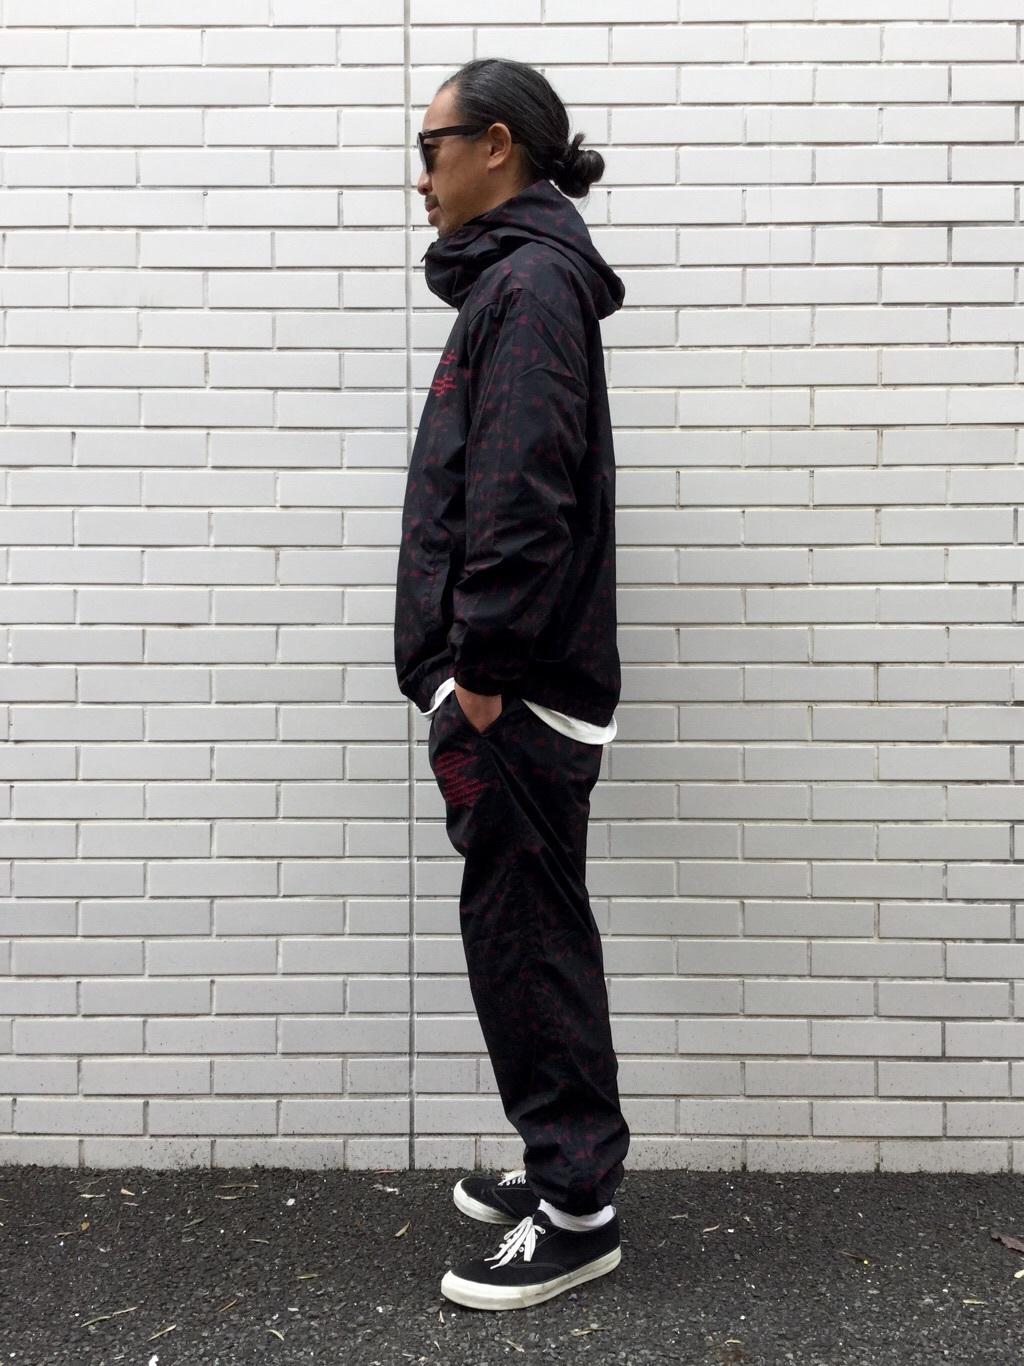 TOKYO HARAJUKU店のKEITAROさんのEDWINの【ガレージセール】【コンセプトショップ限定】EDWIN×ZOO YORK PRINT JACKETを使ったコーディネート